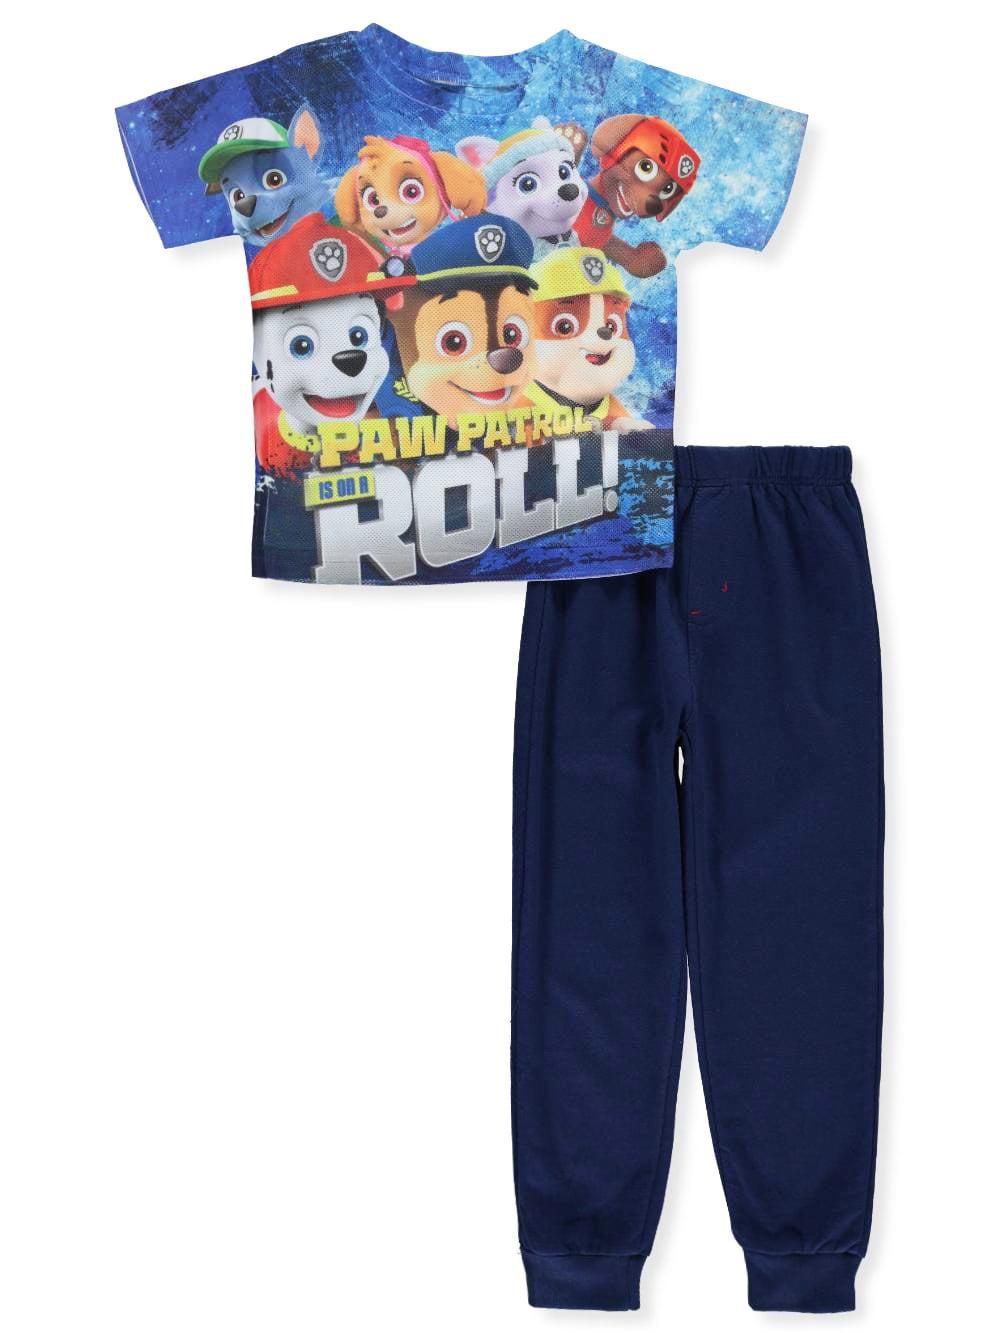 Paw Patrol Boys' 2-Piece Pants Set Outfit